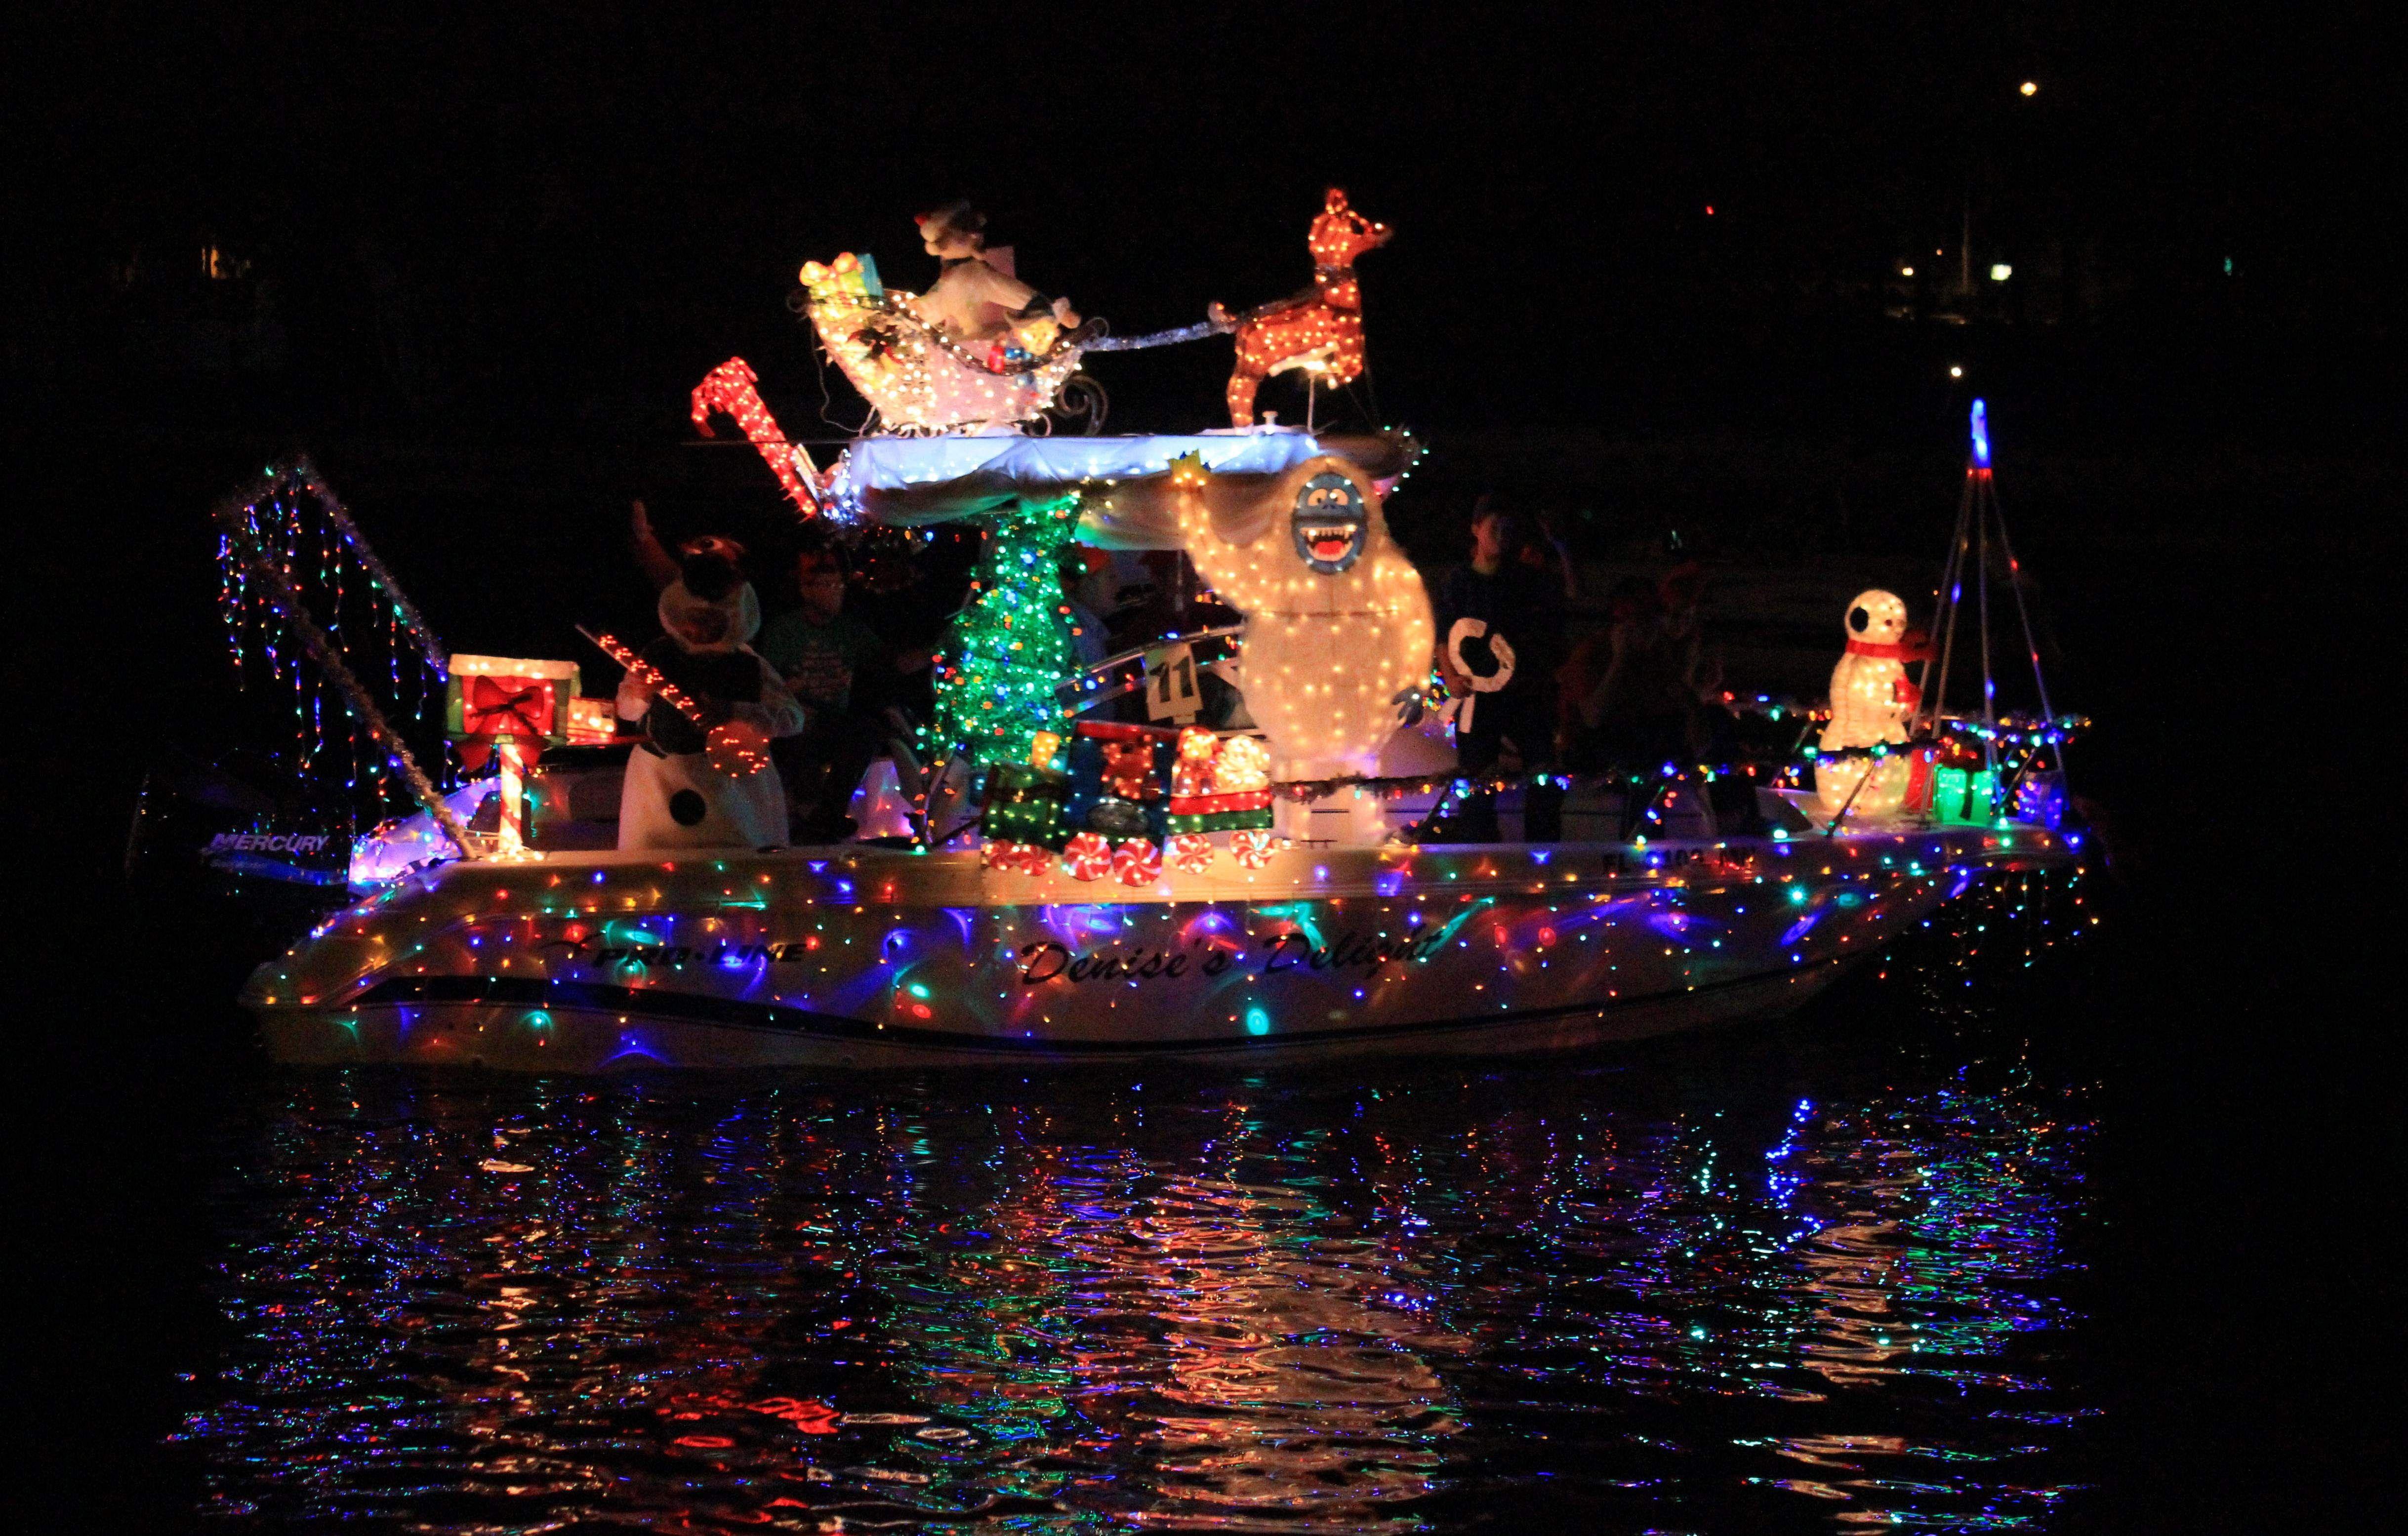 Boat parade lights up Cotee River for Christmas | TBO.com | Holiday ...